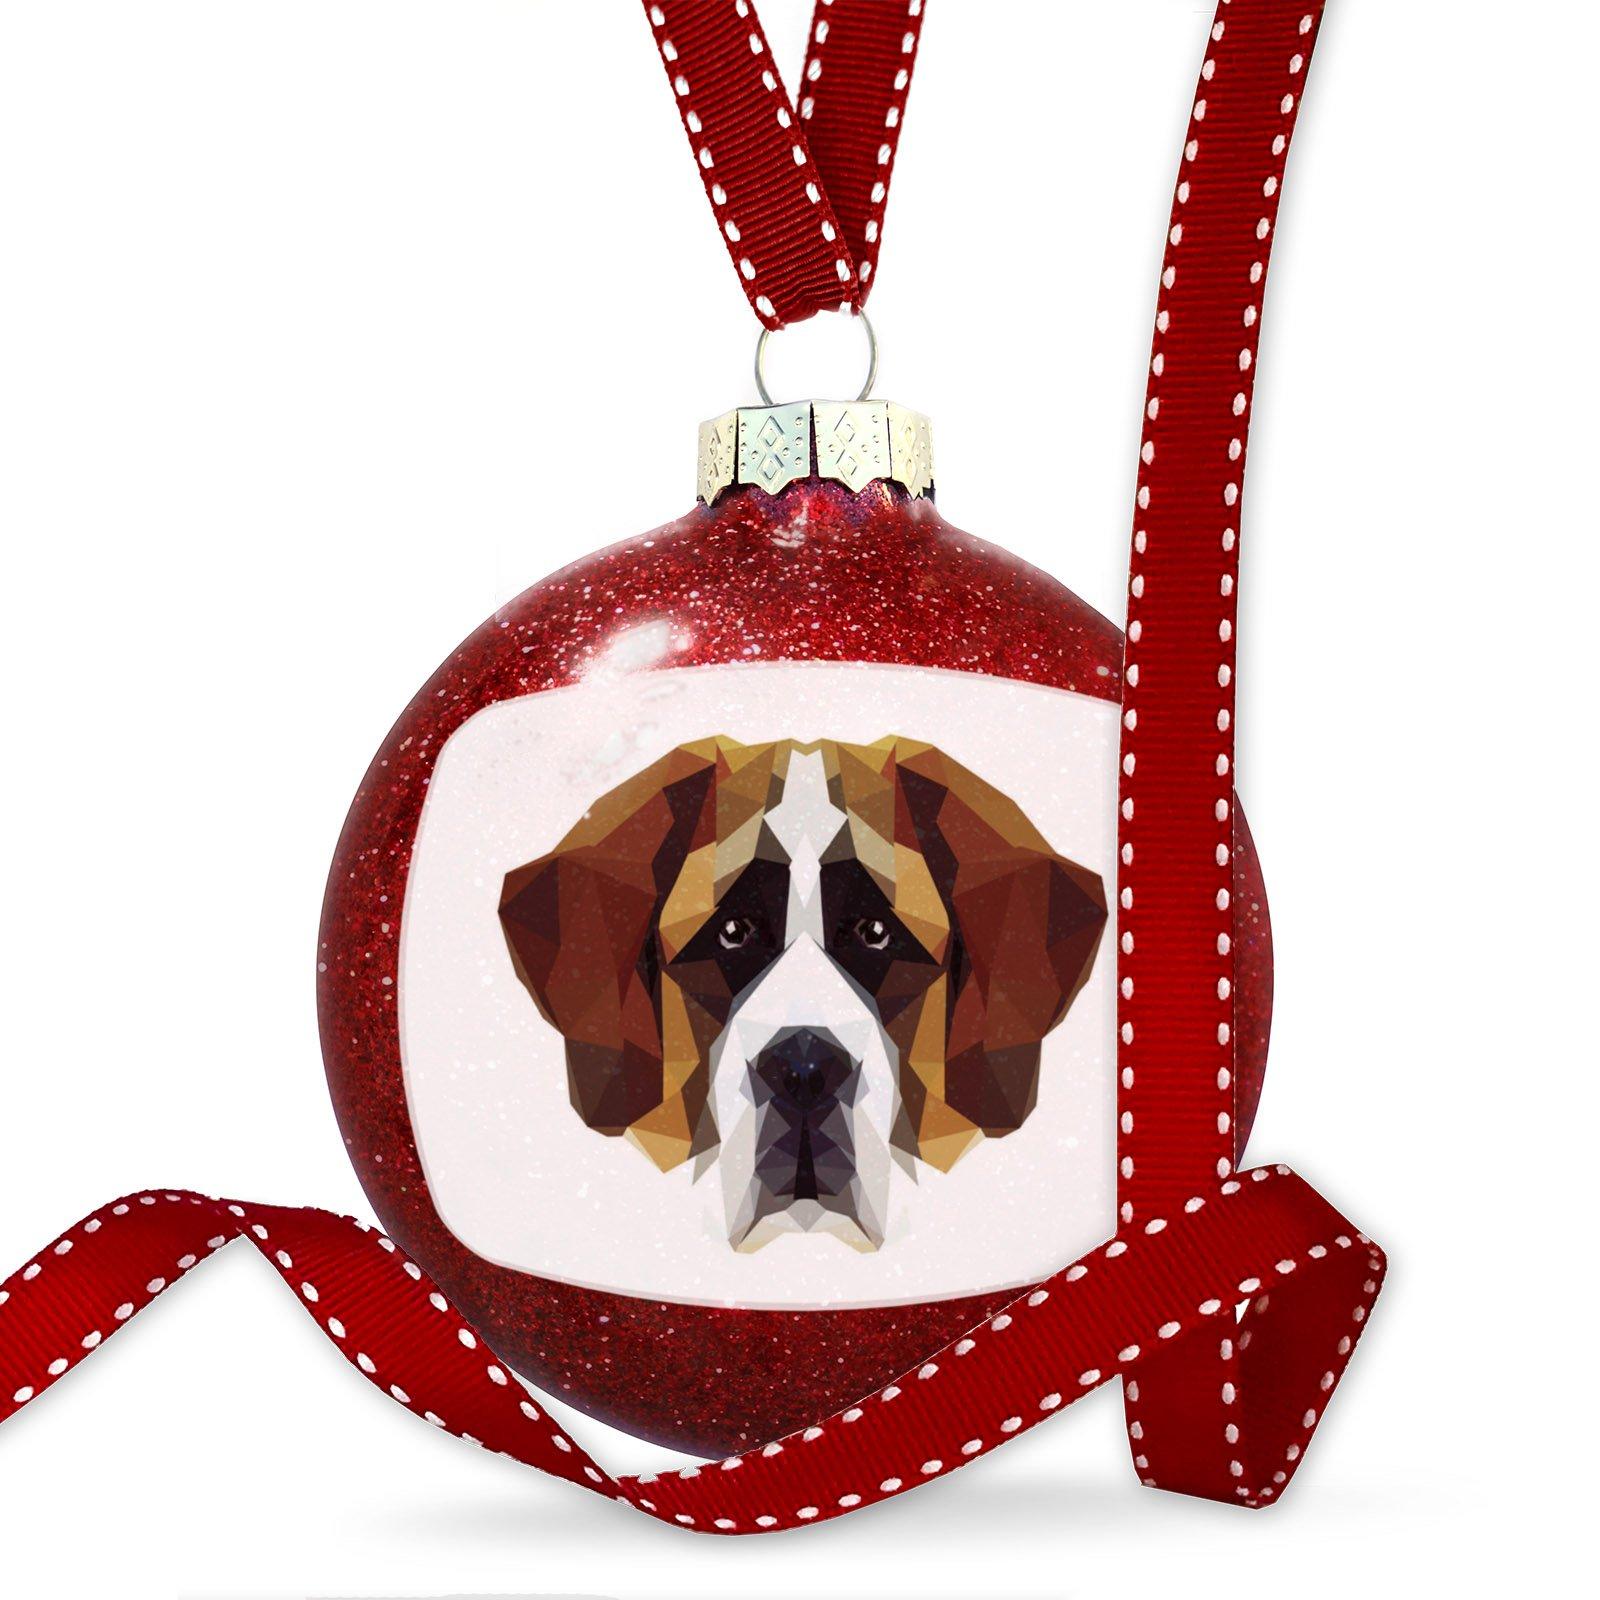 Christmas Decoration Geometric Animal art St. Bernard Dog Ornament